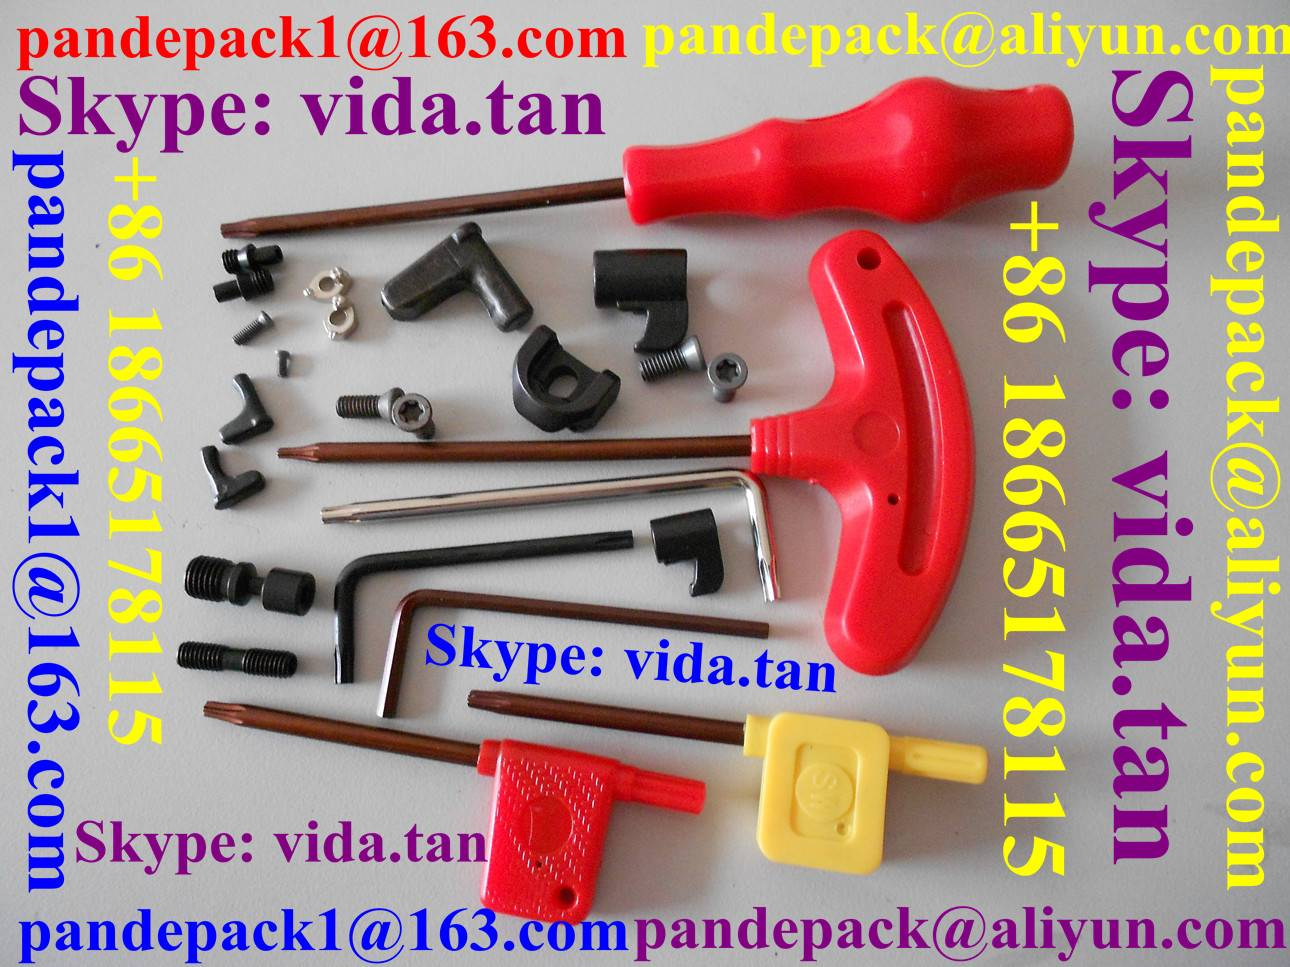 Tool Parts/Accessories/Alloy Shim/Clamp/Lever/Torx Key/Allen Key/Clamp Screw/Shim Screw/Torx Screw